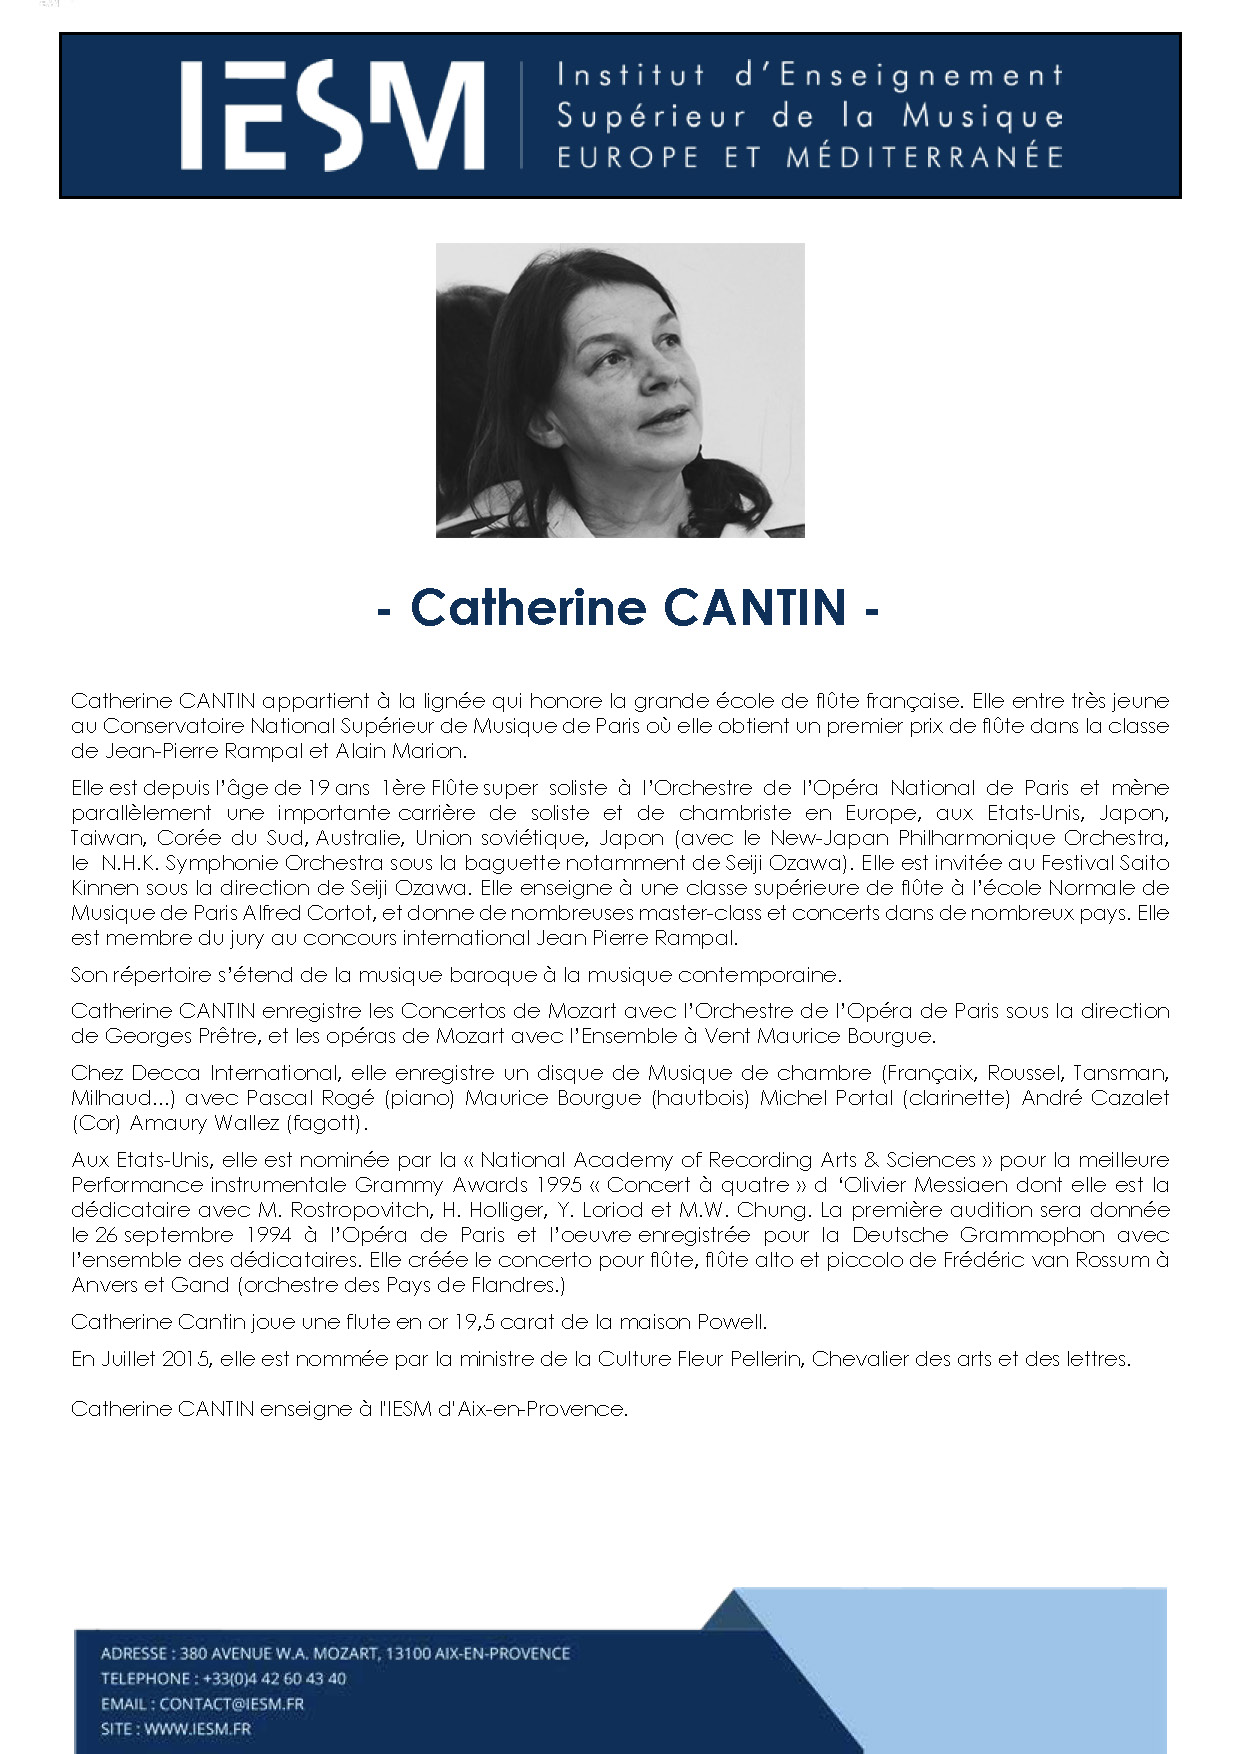 CANTI CATHERINECANTIN